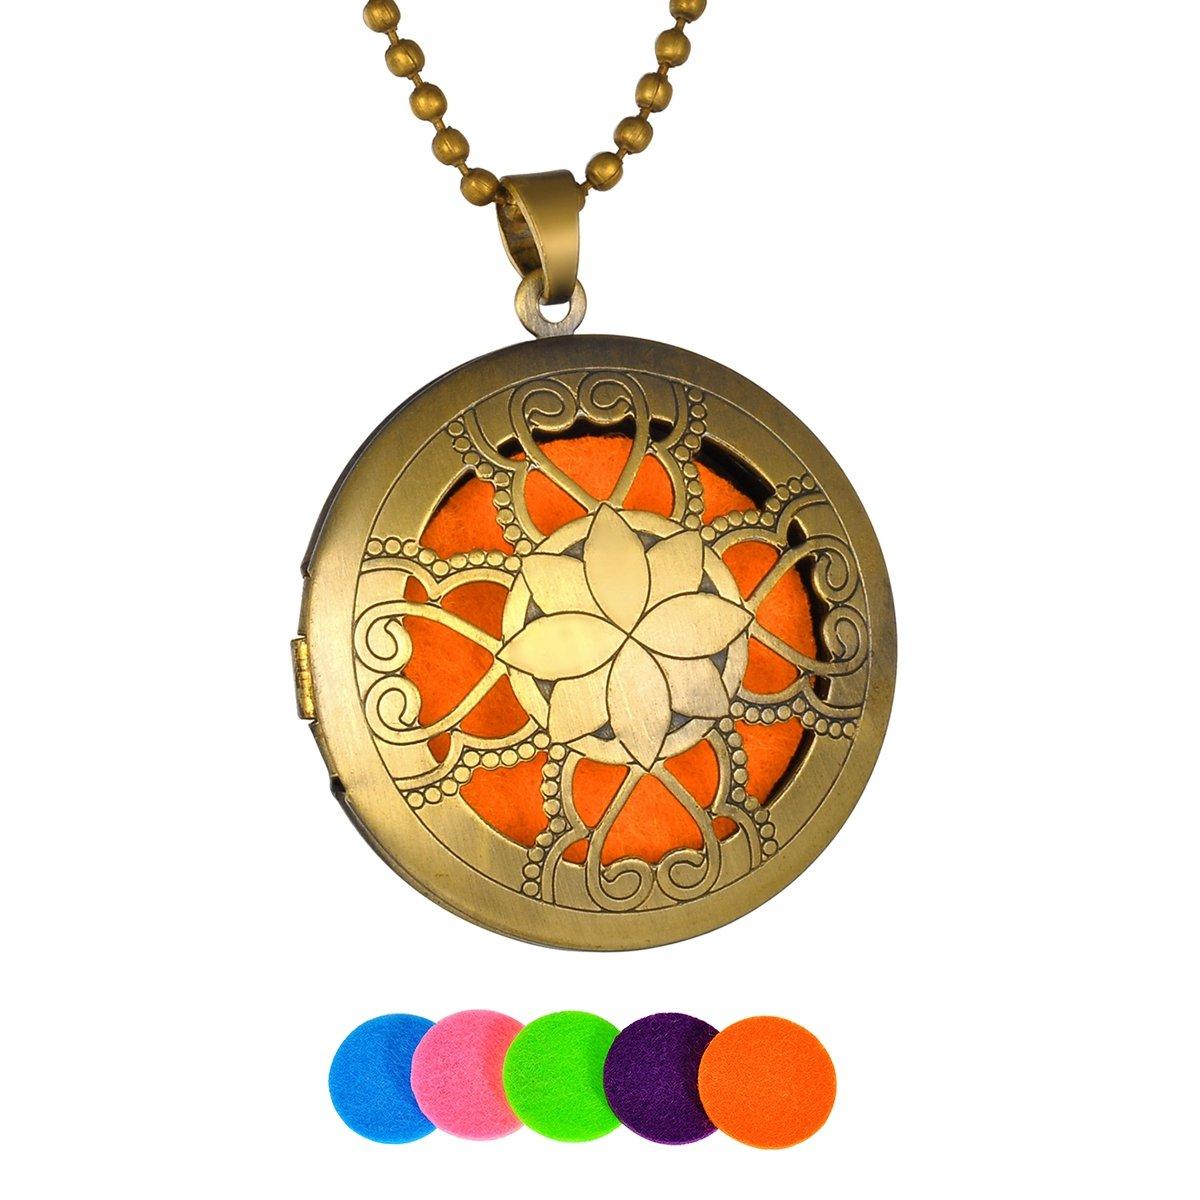 HooAMI Heart Flower Aromatherapy Essential Oil Diffuser Necklace Pendant Locket Jewelry Bronze TY UPIE11689